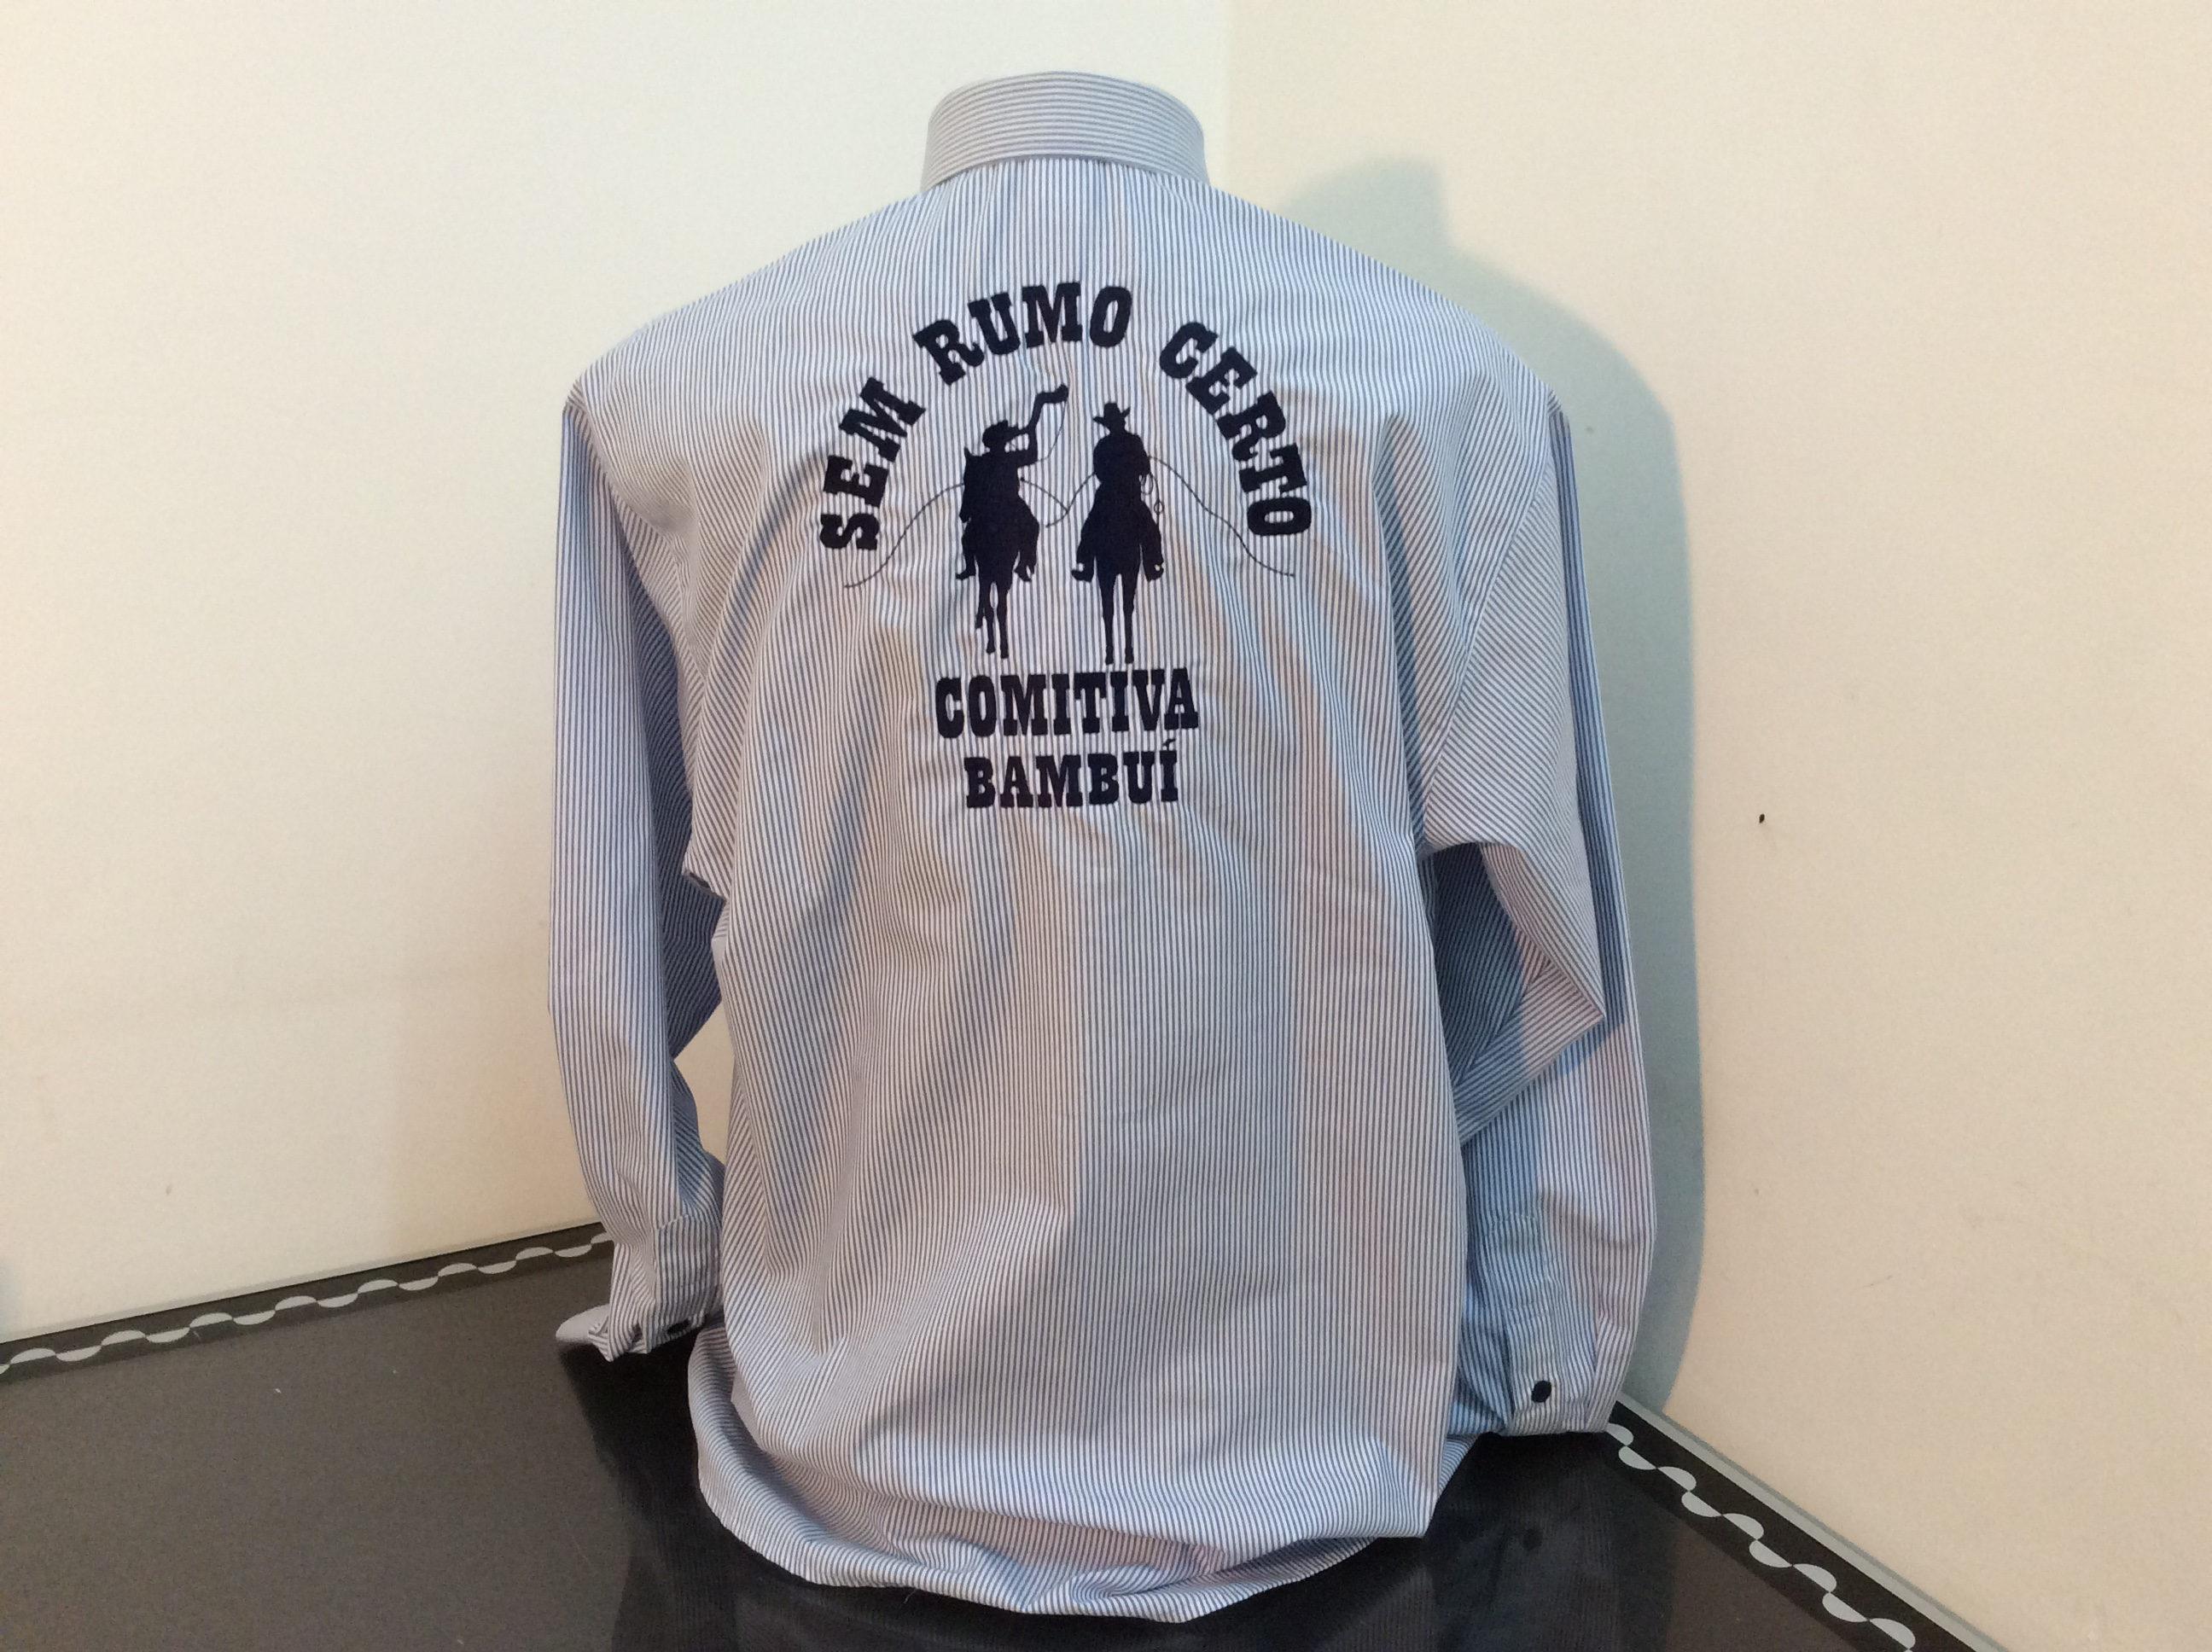 Costa camisa social tecido misto